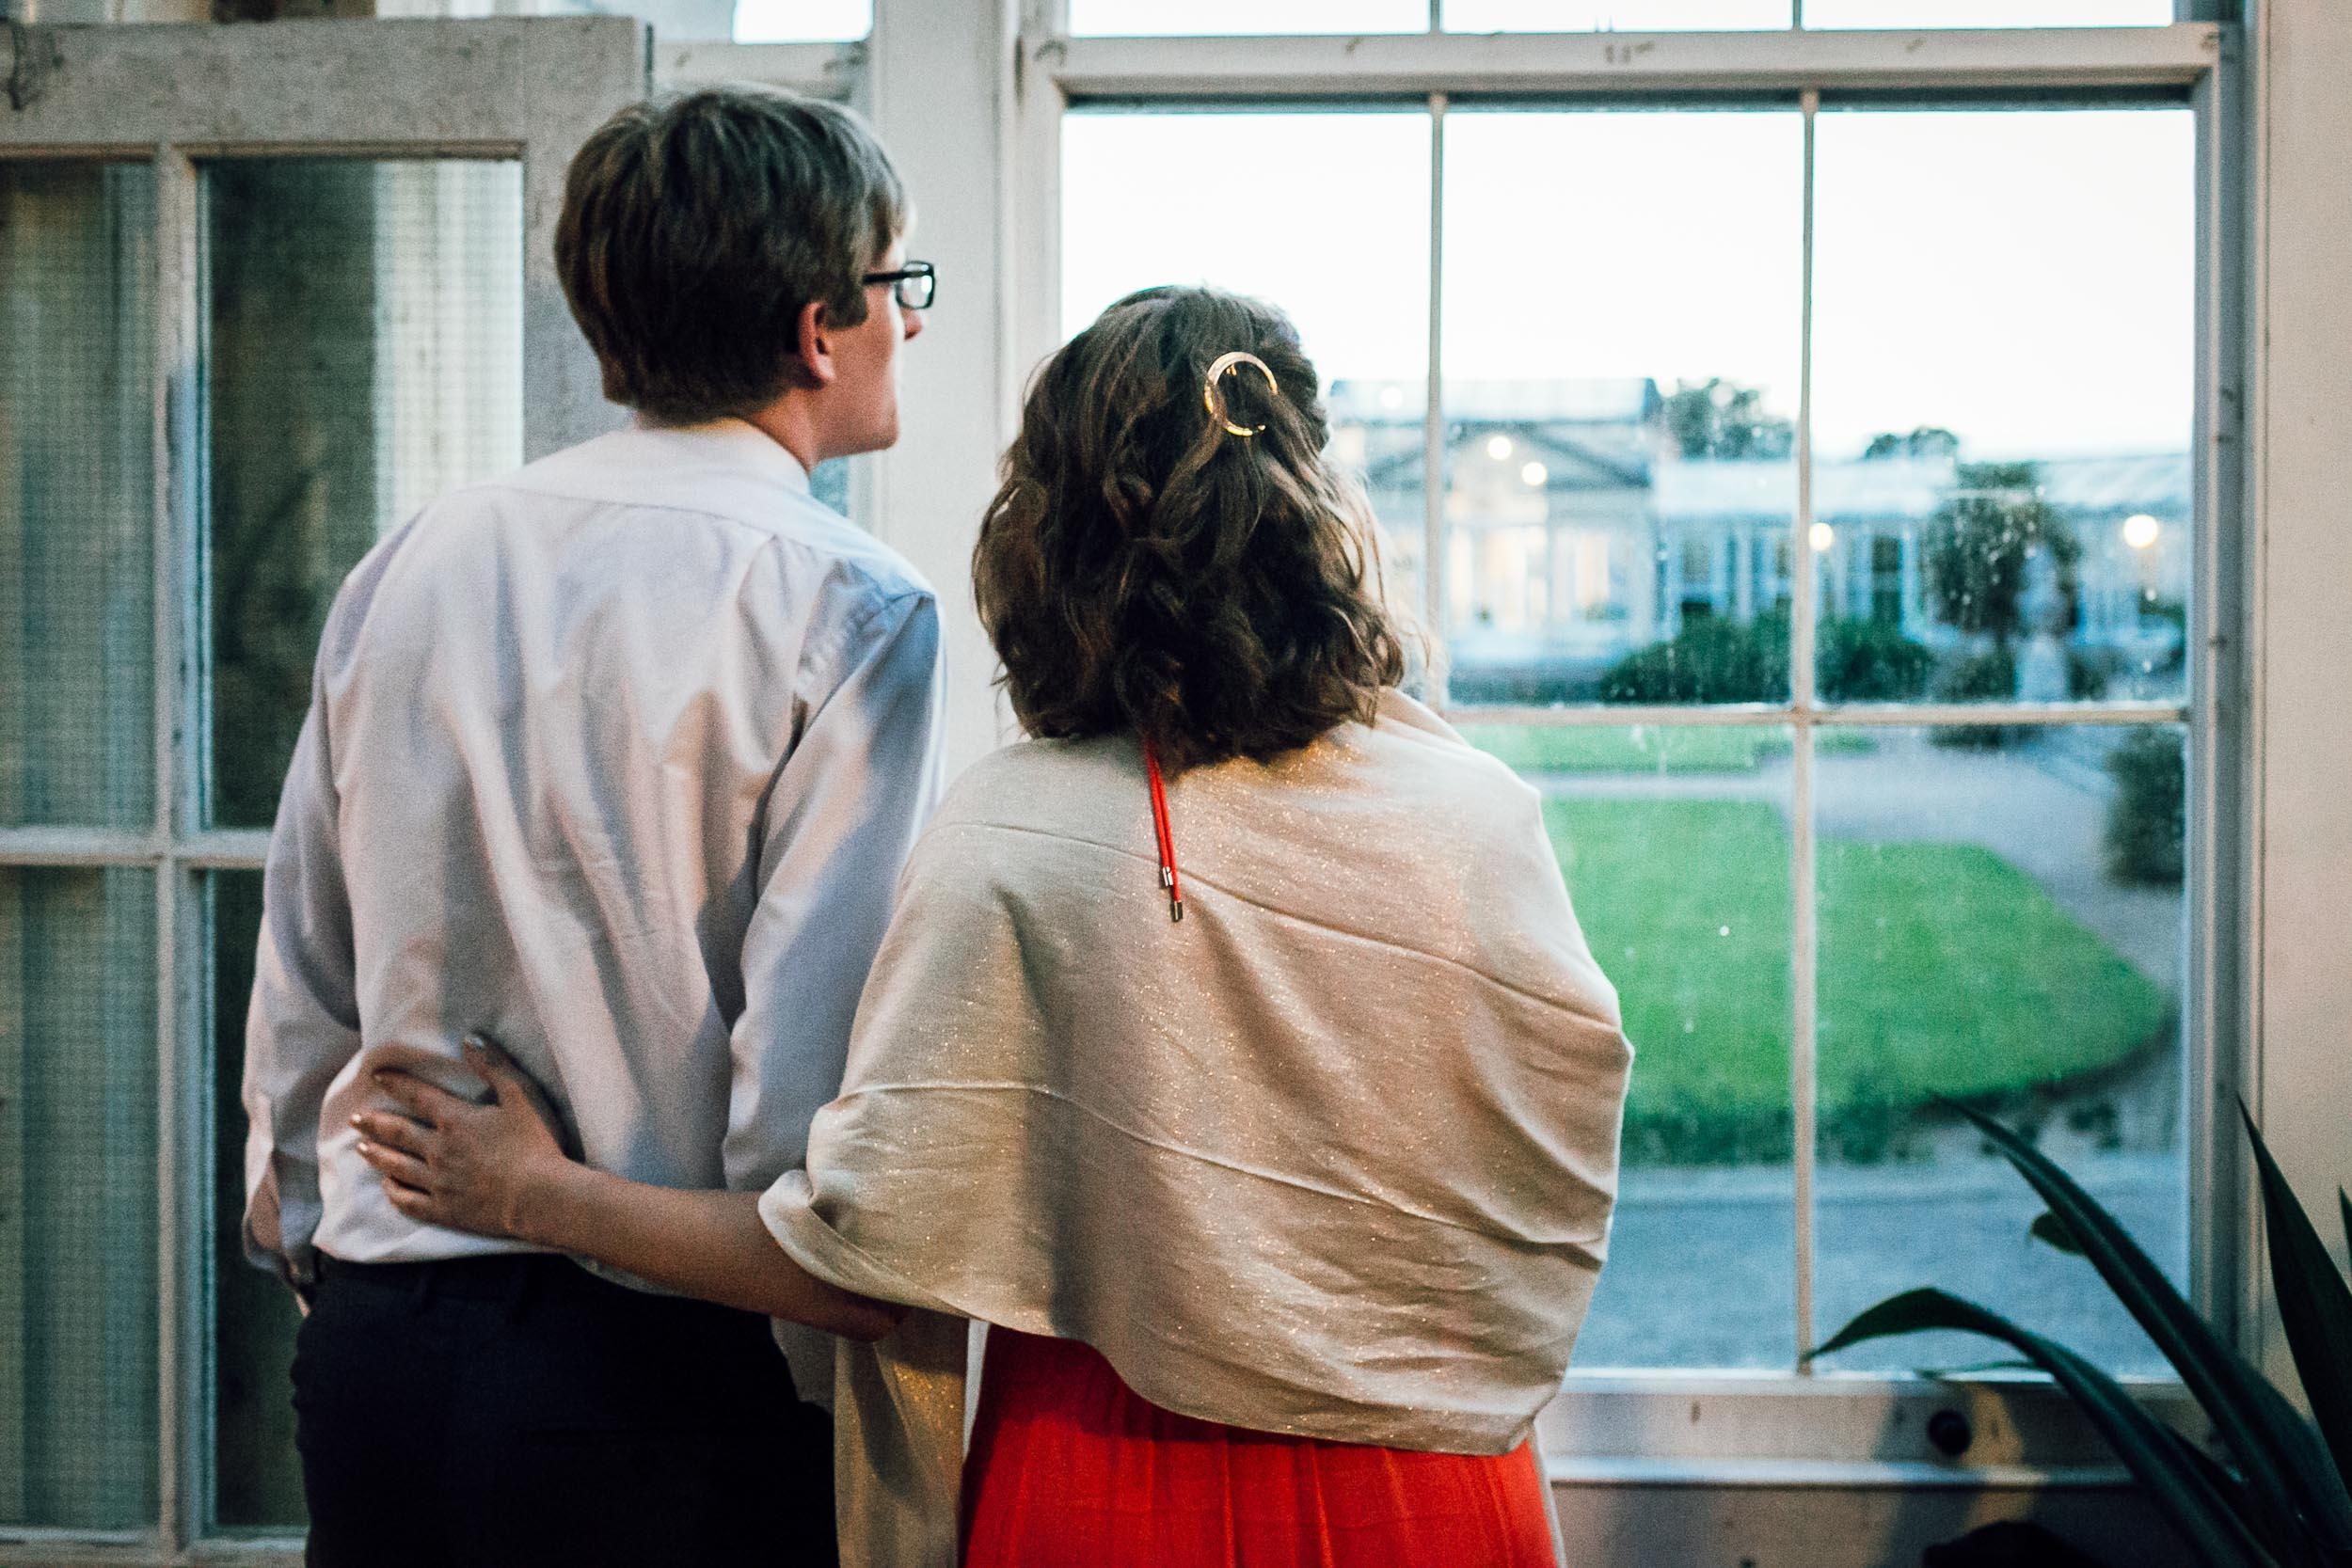 syon-house-wedding-photographer-london 157.jpg